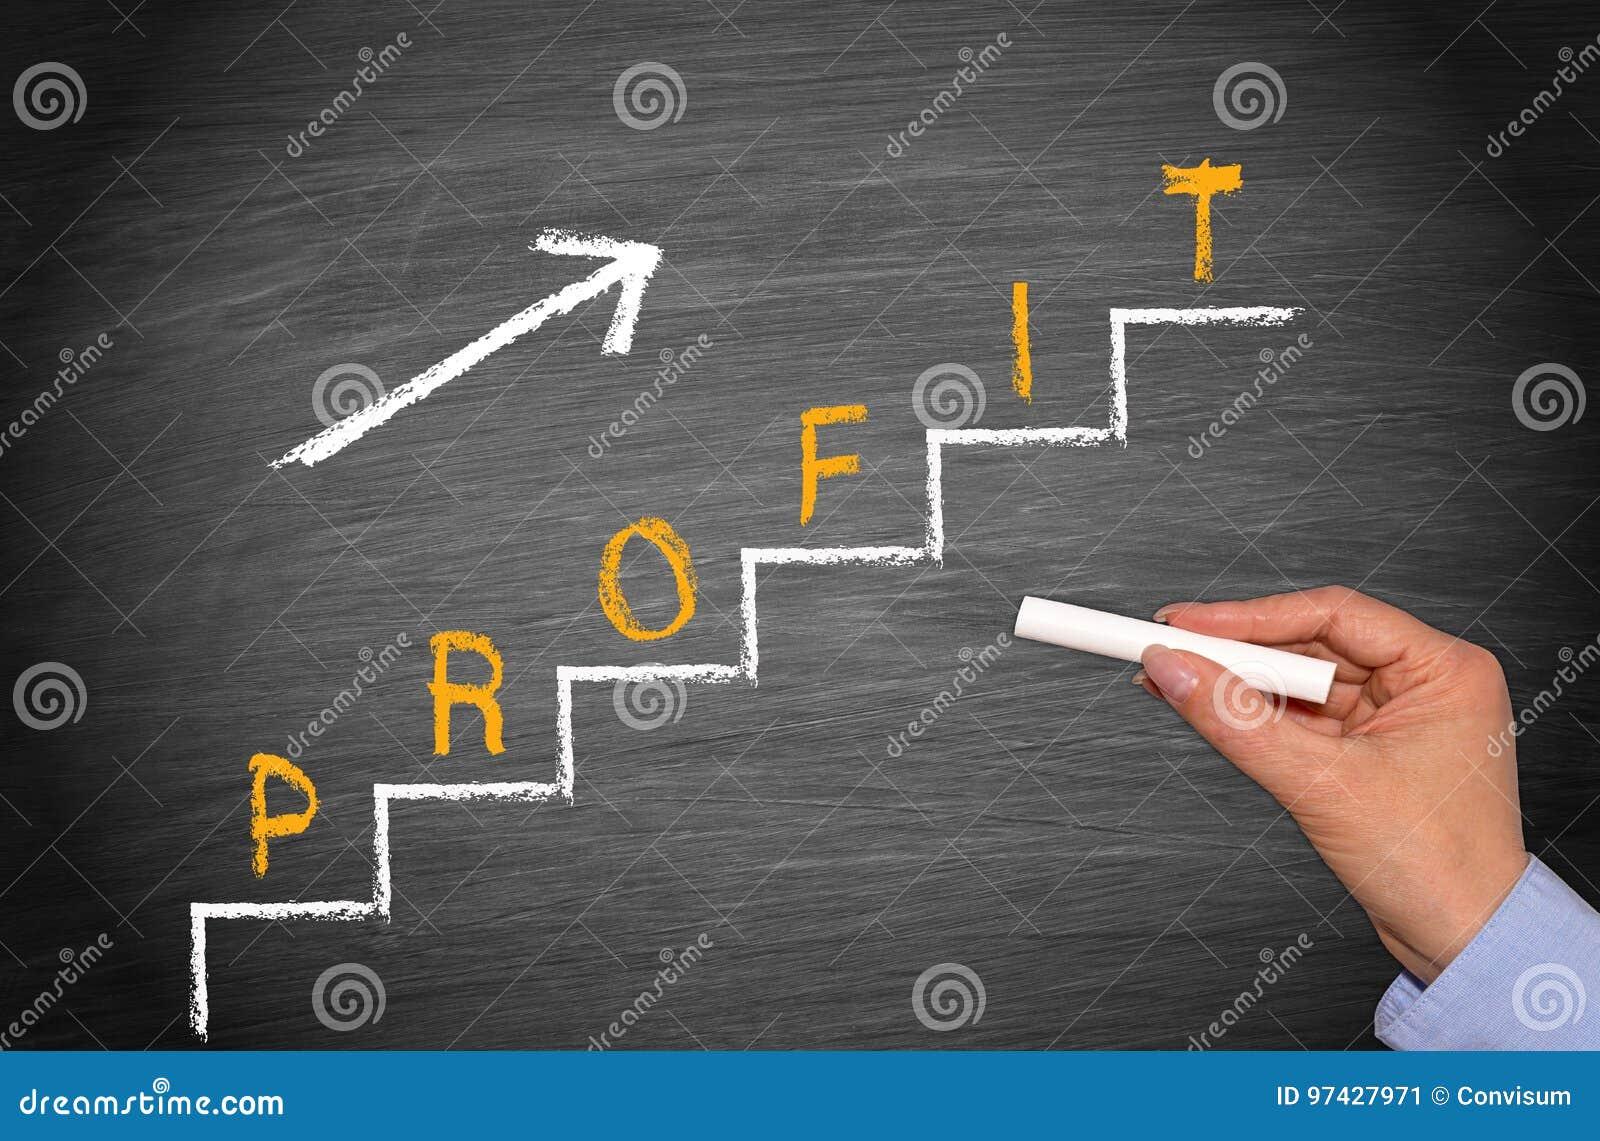 Profit - Business and Finance Concept